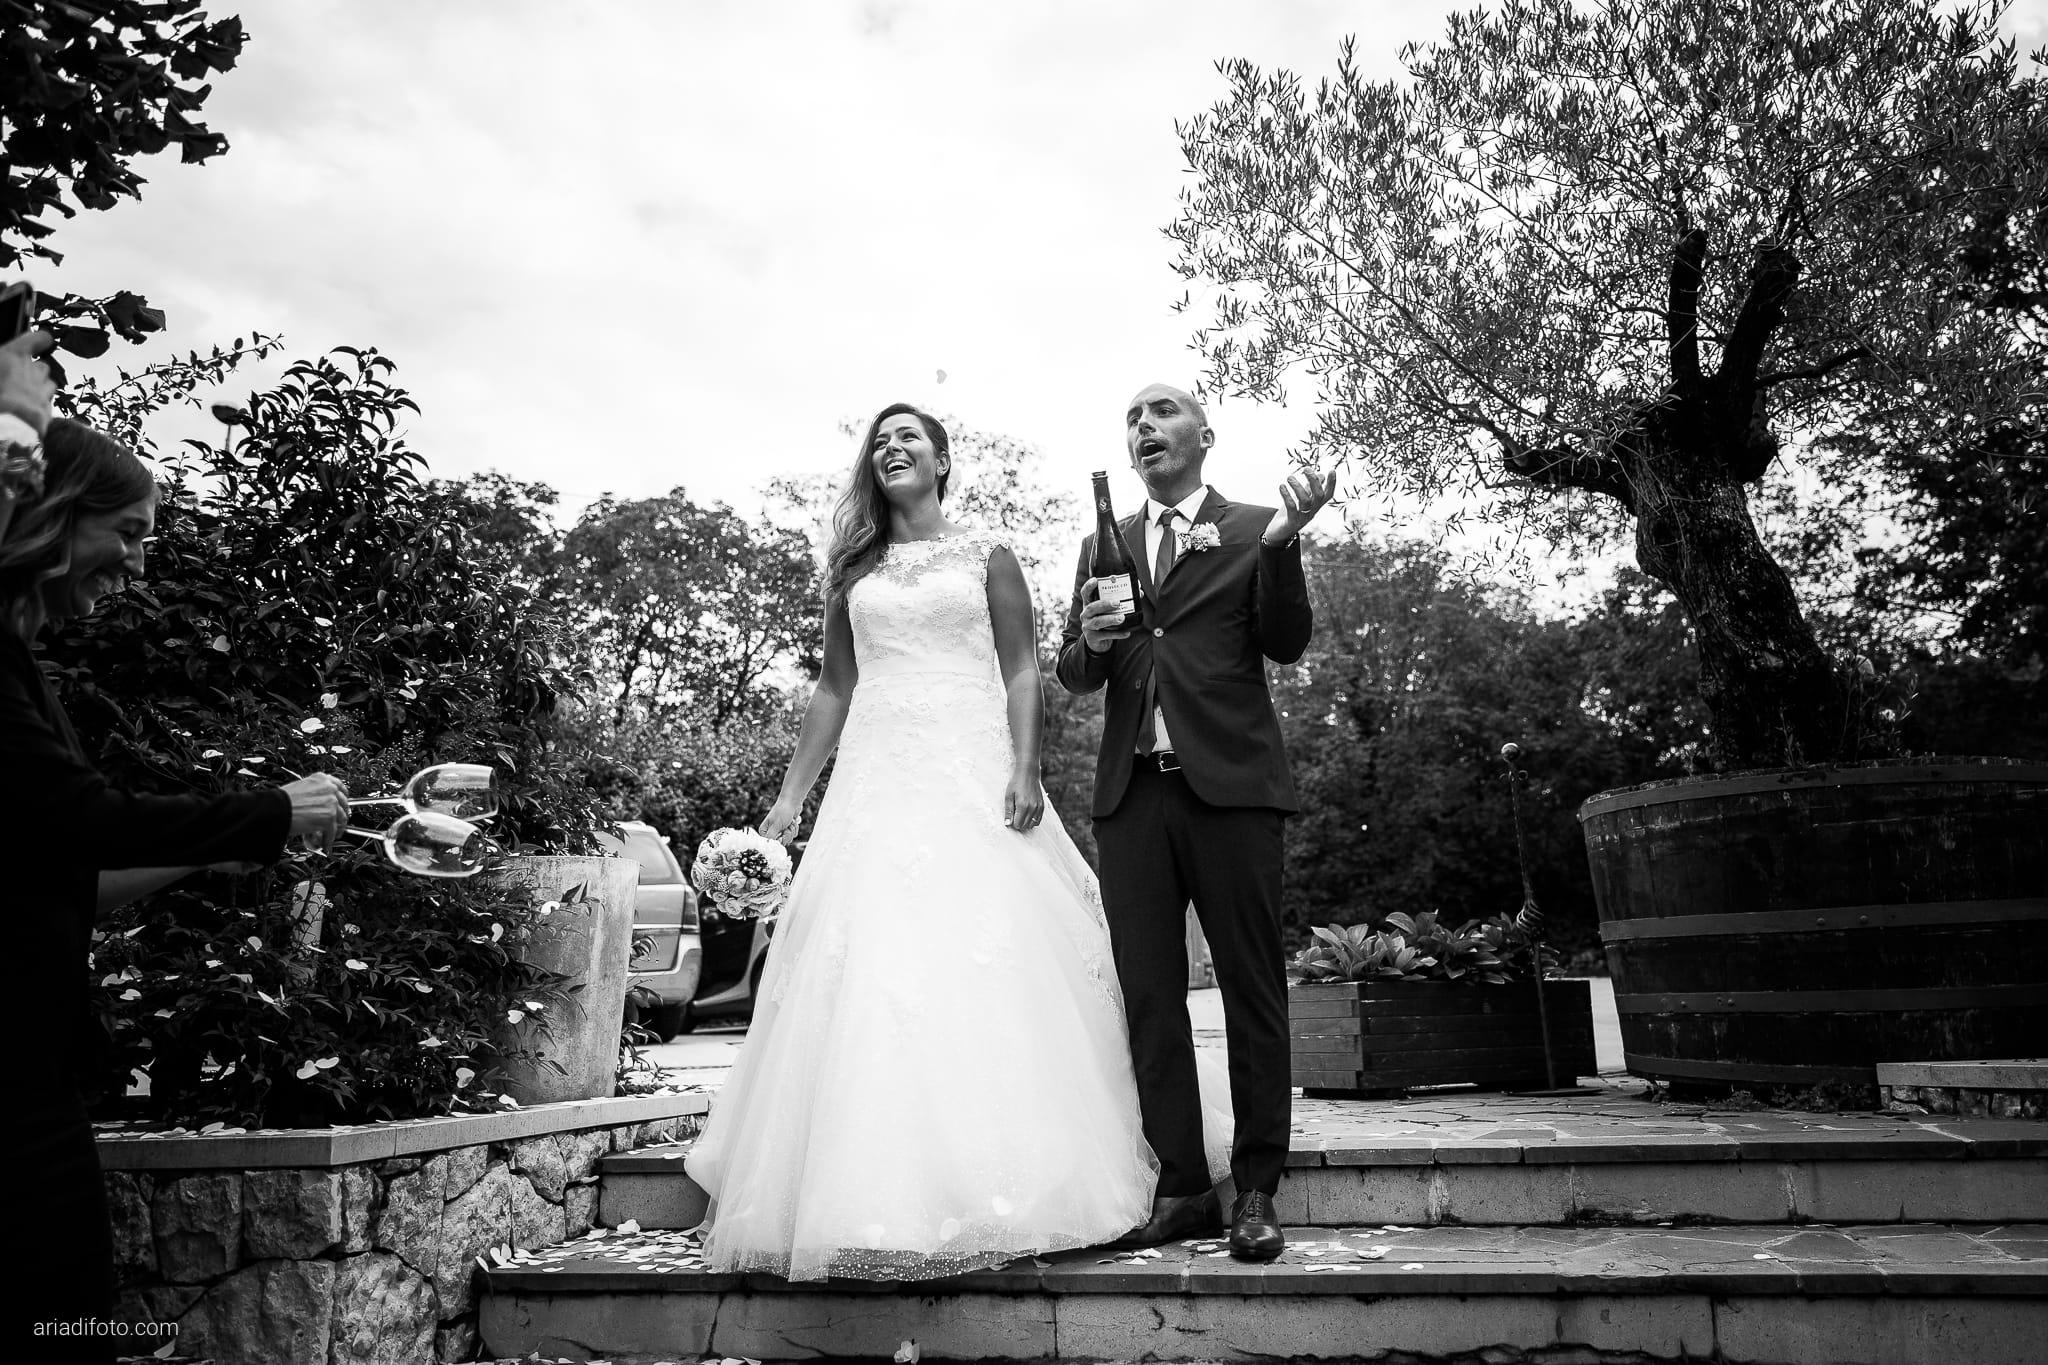 Giorgia Davide Matrimonio Villa Revoltella Salvia Rosmarino Trieste ricevimento brindisi